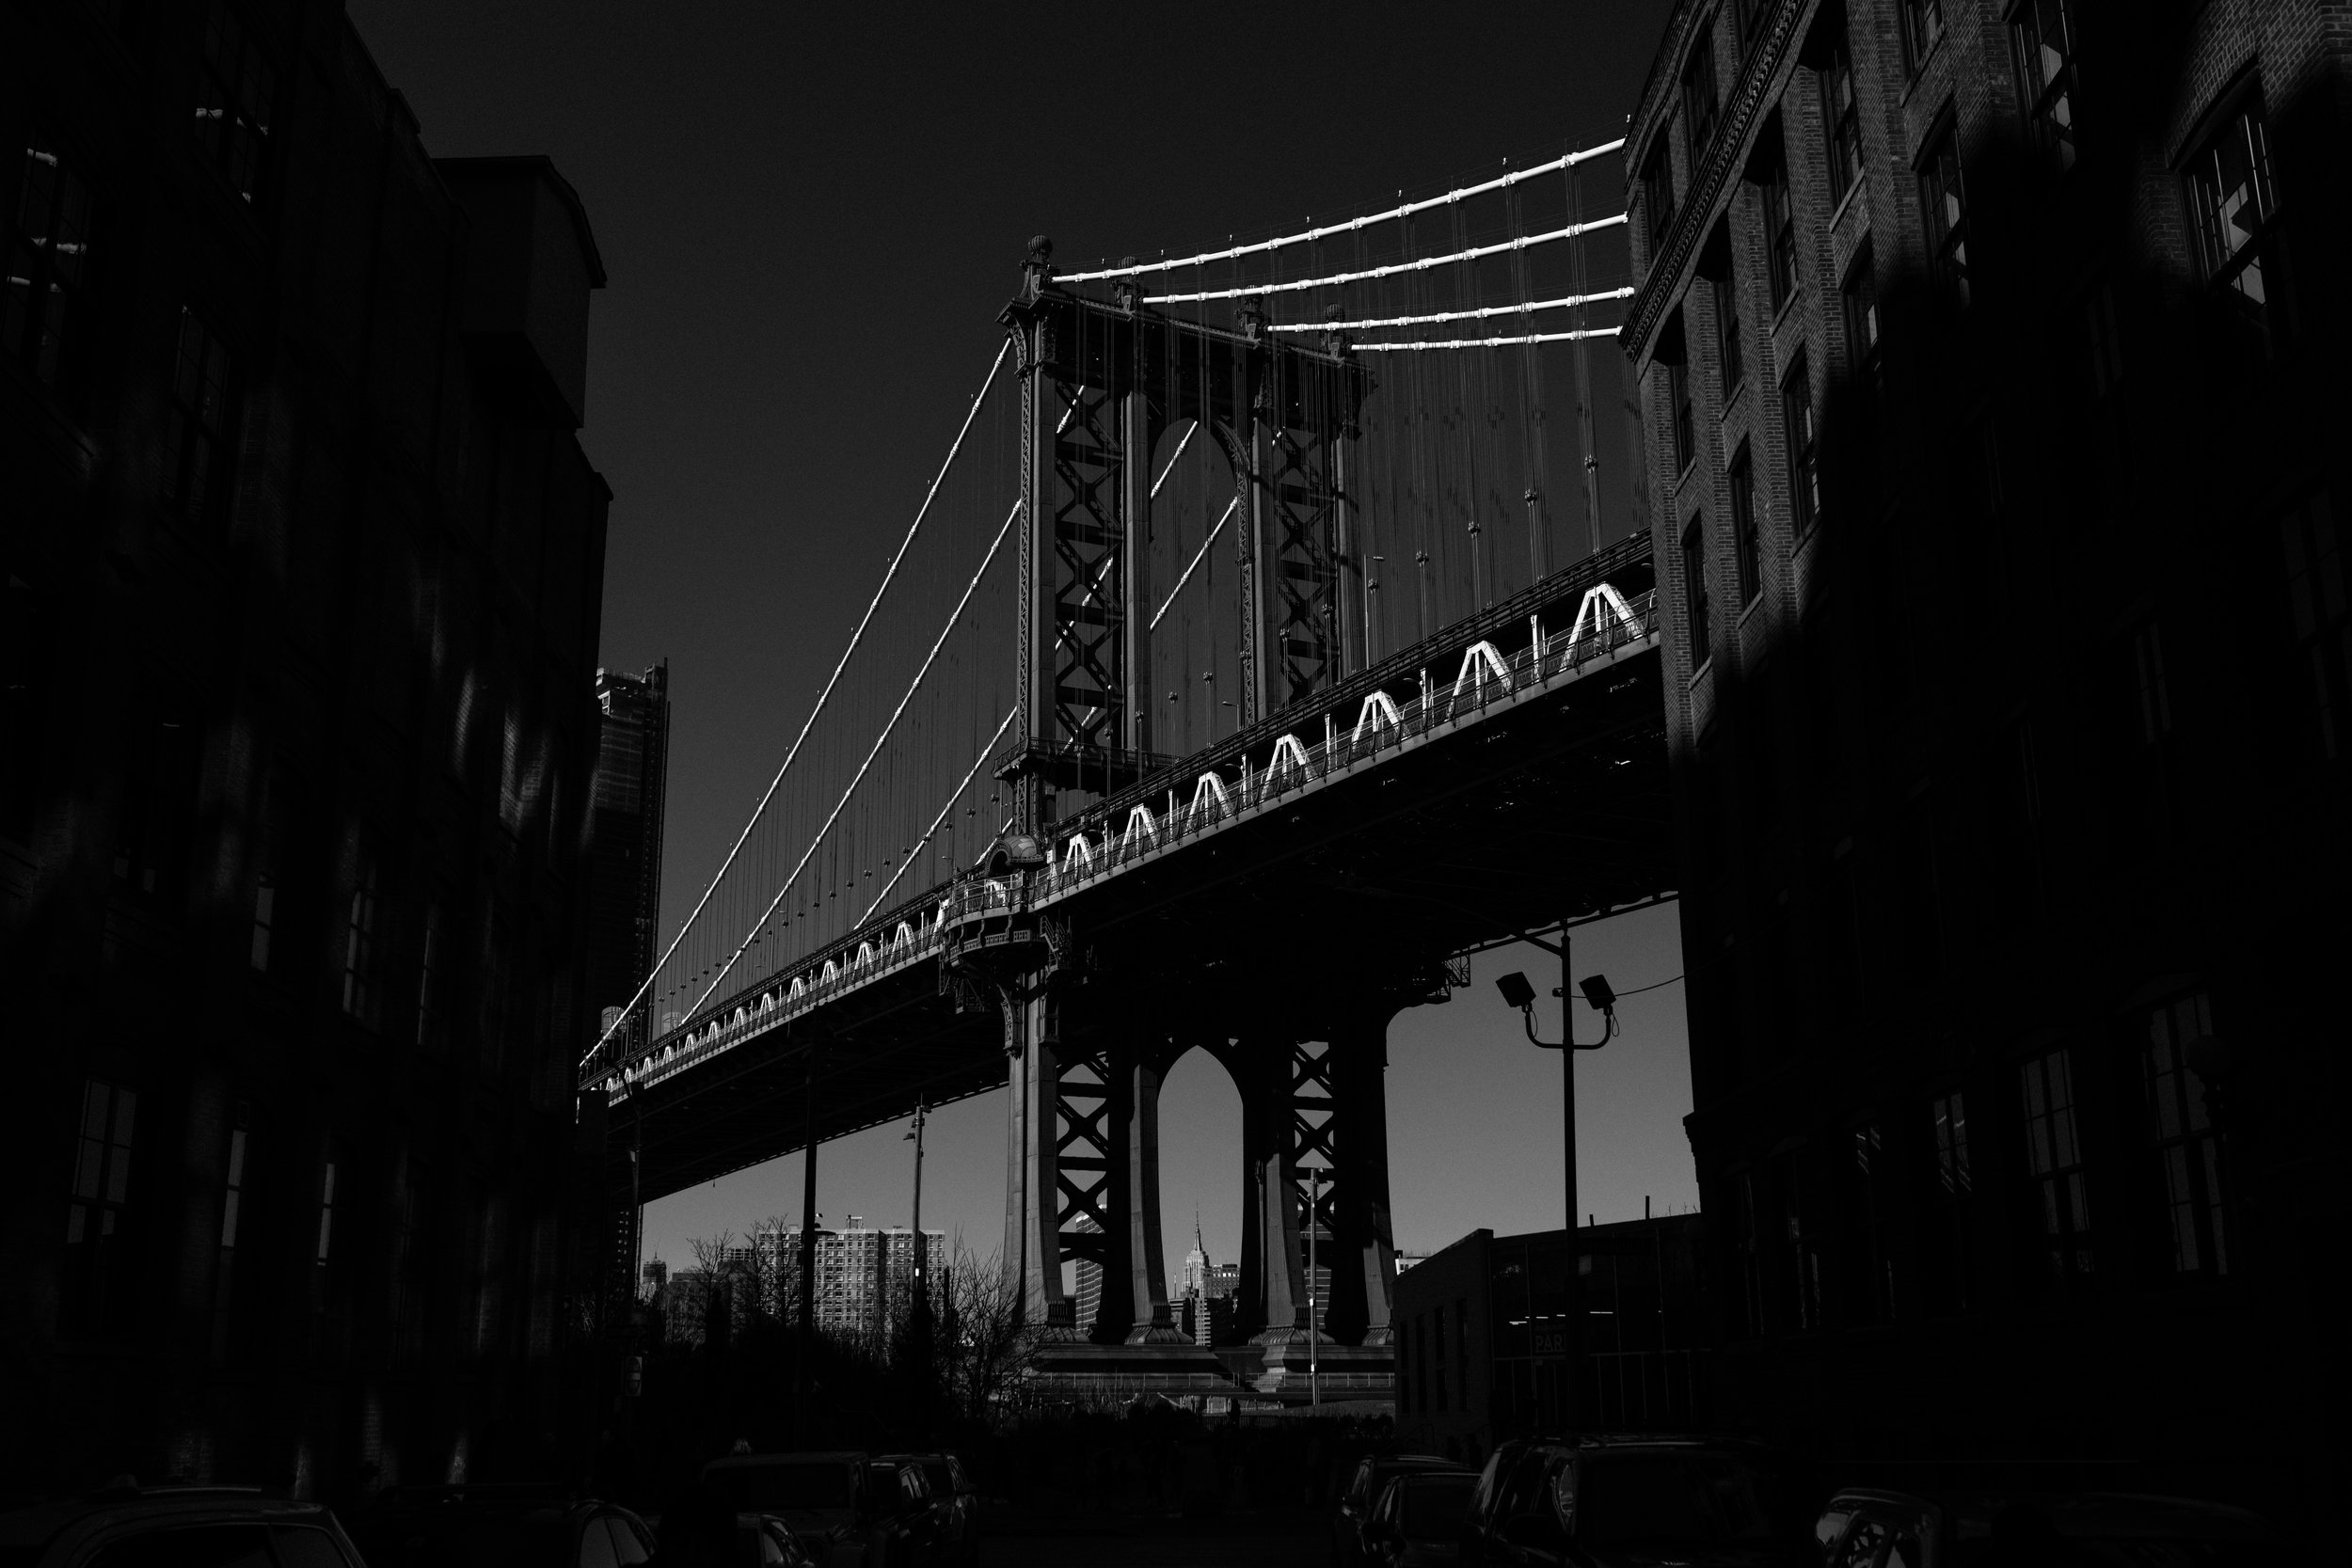 NYC_0002.jpg